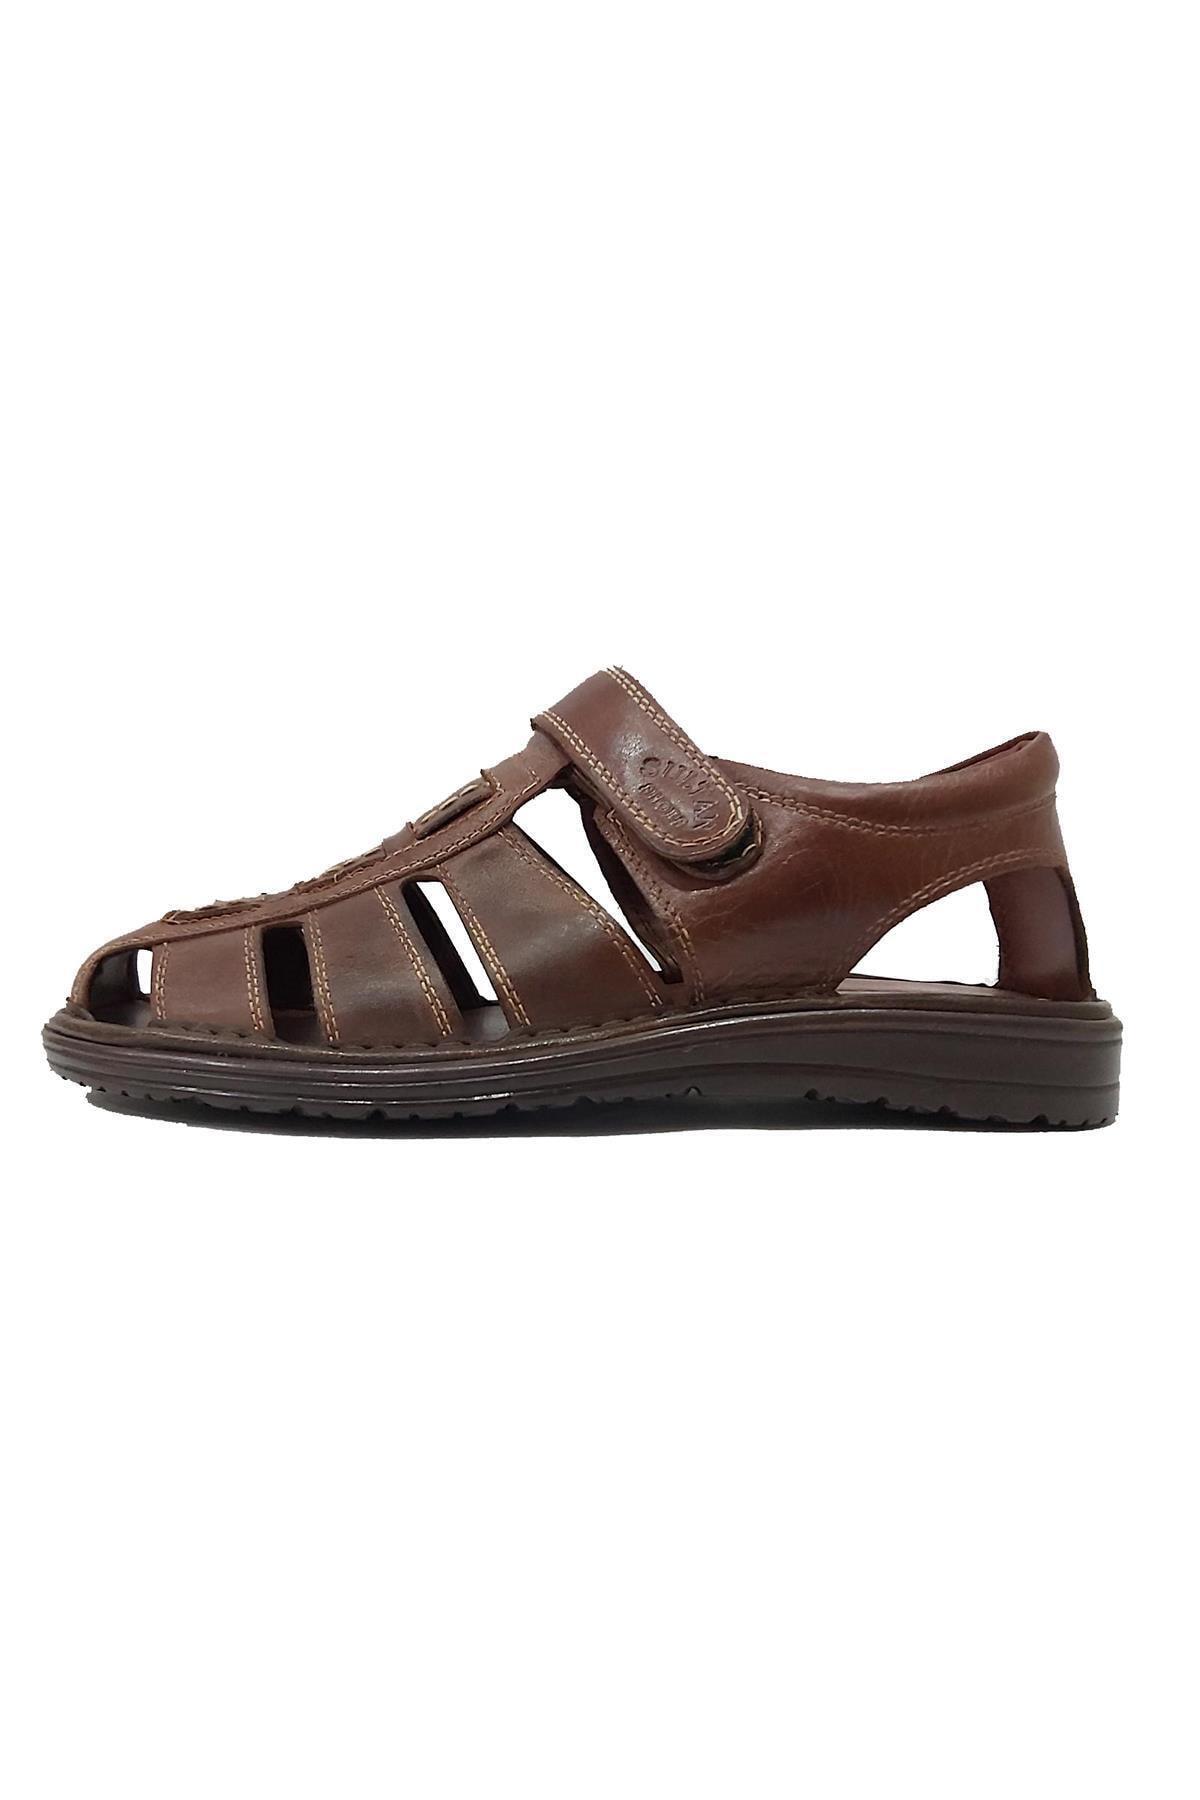 Sultan 214 Hakiki Deri Hafif Erkek Sandalet 2